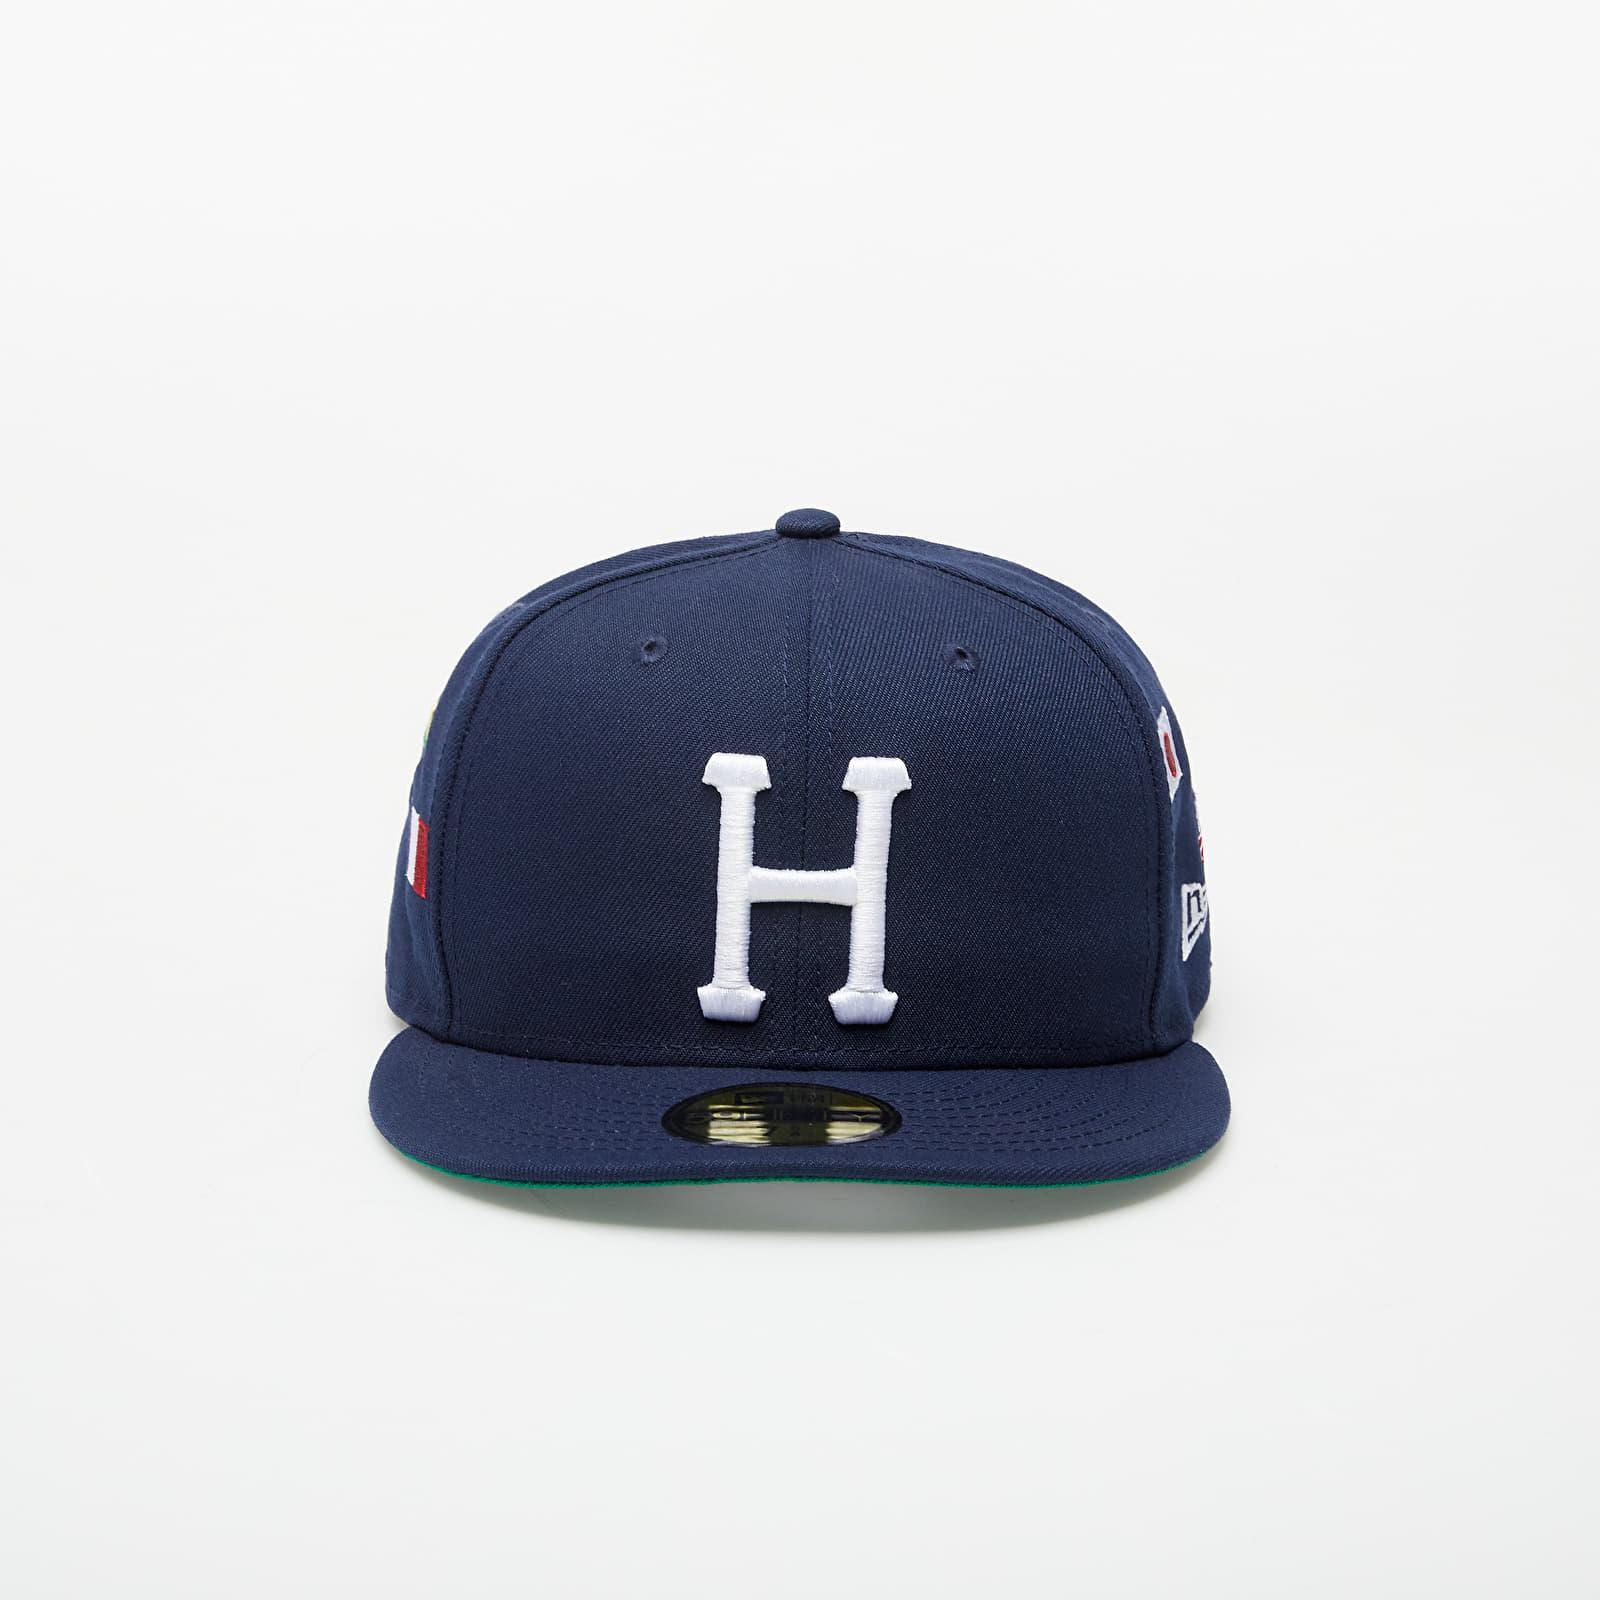 Caps HUF x New Era Worl Tour Hat Dark Navy